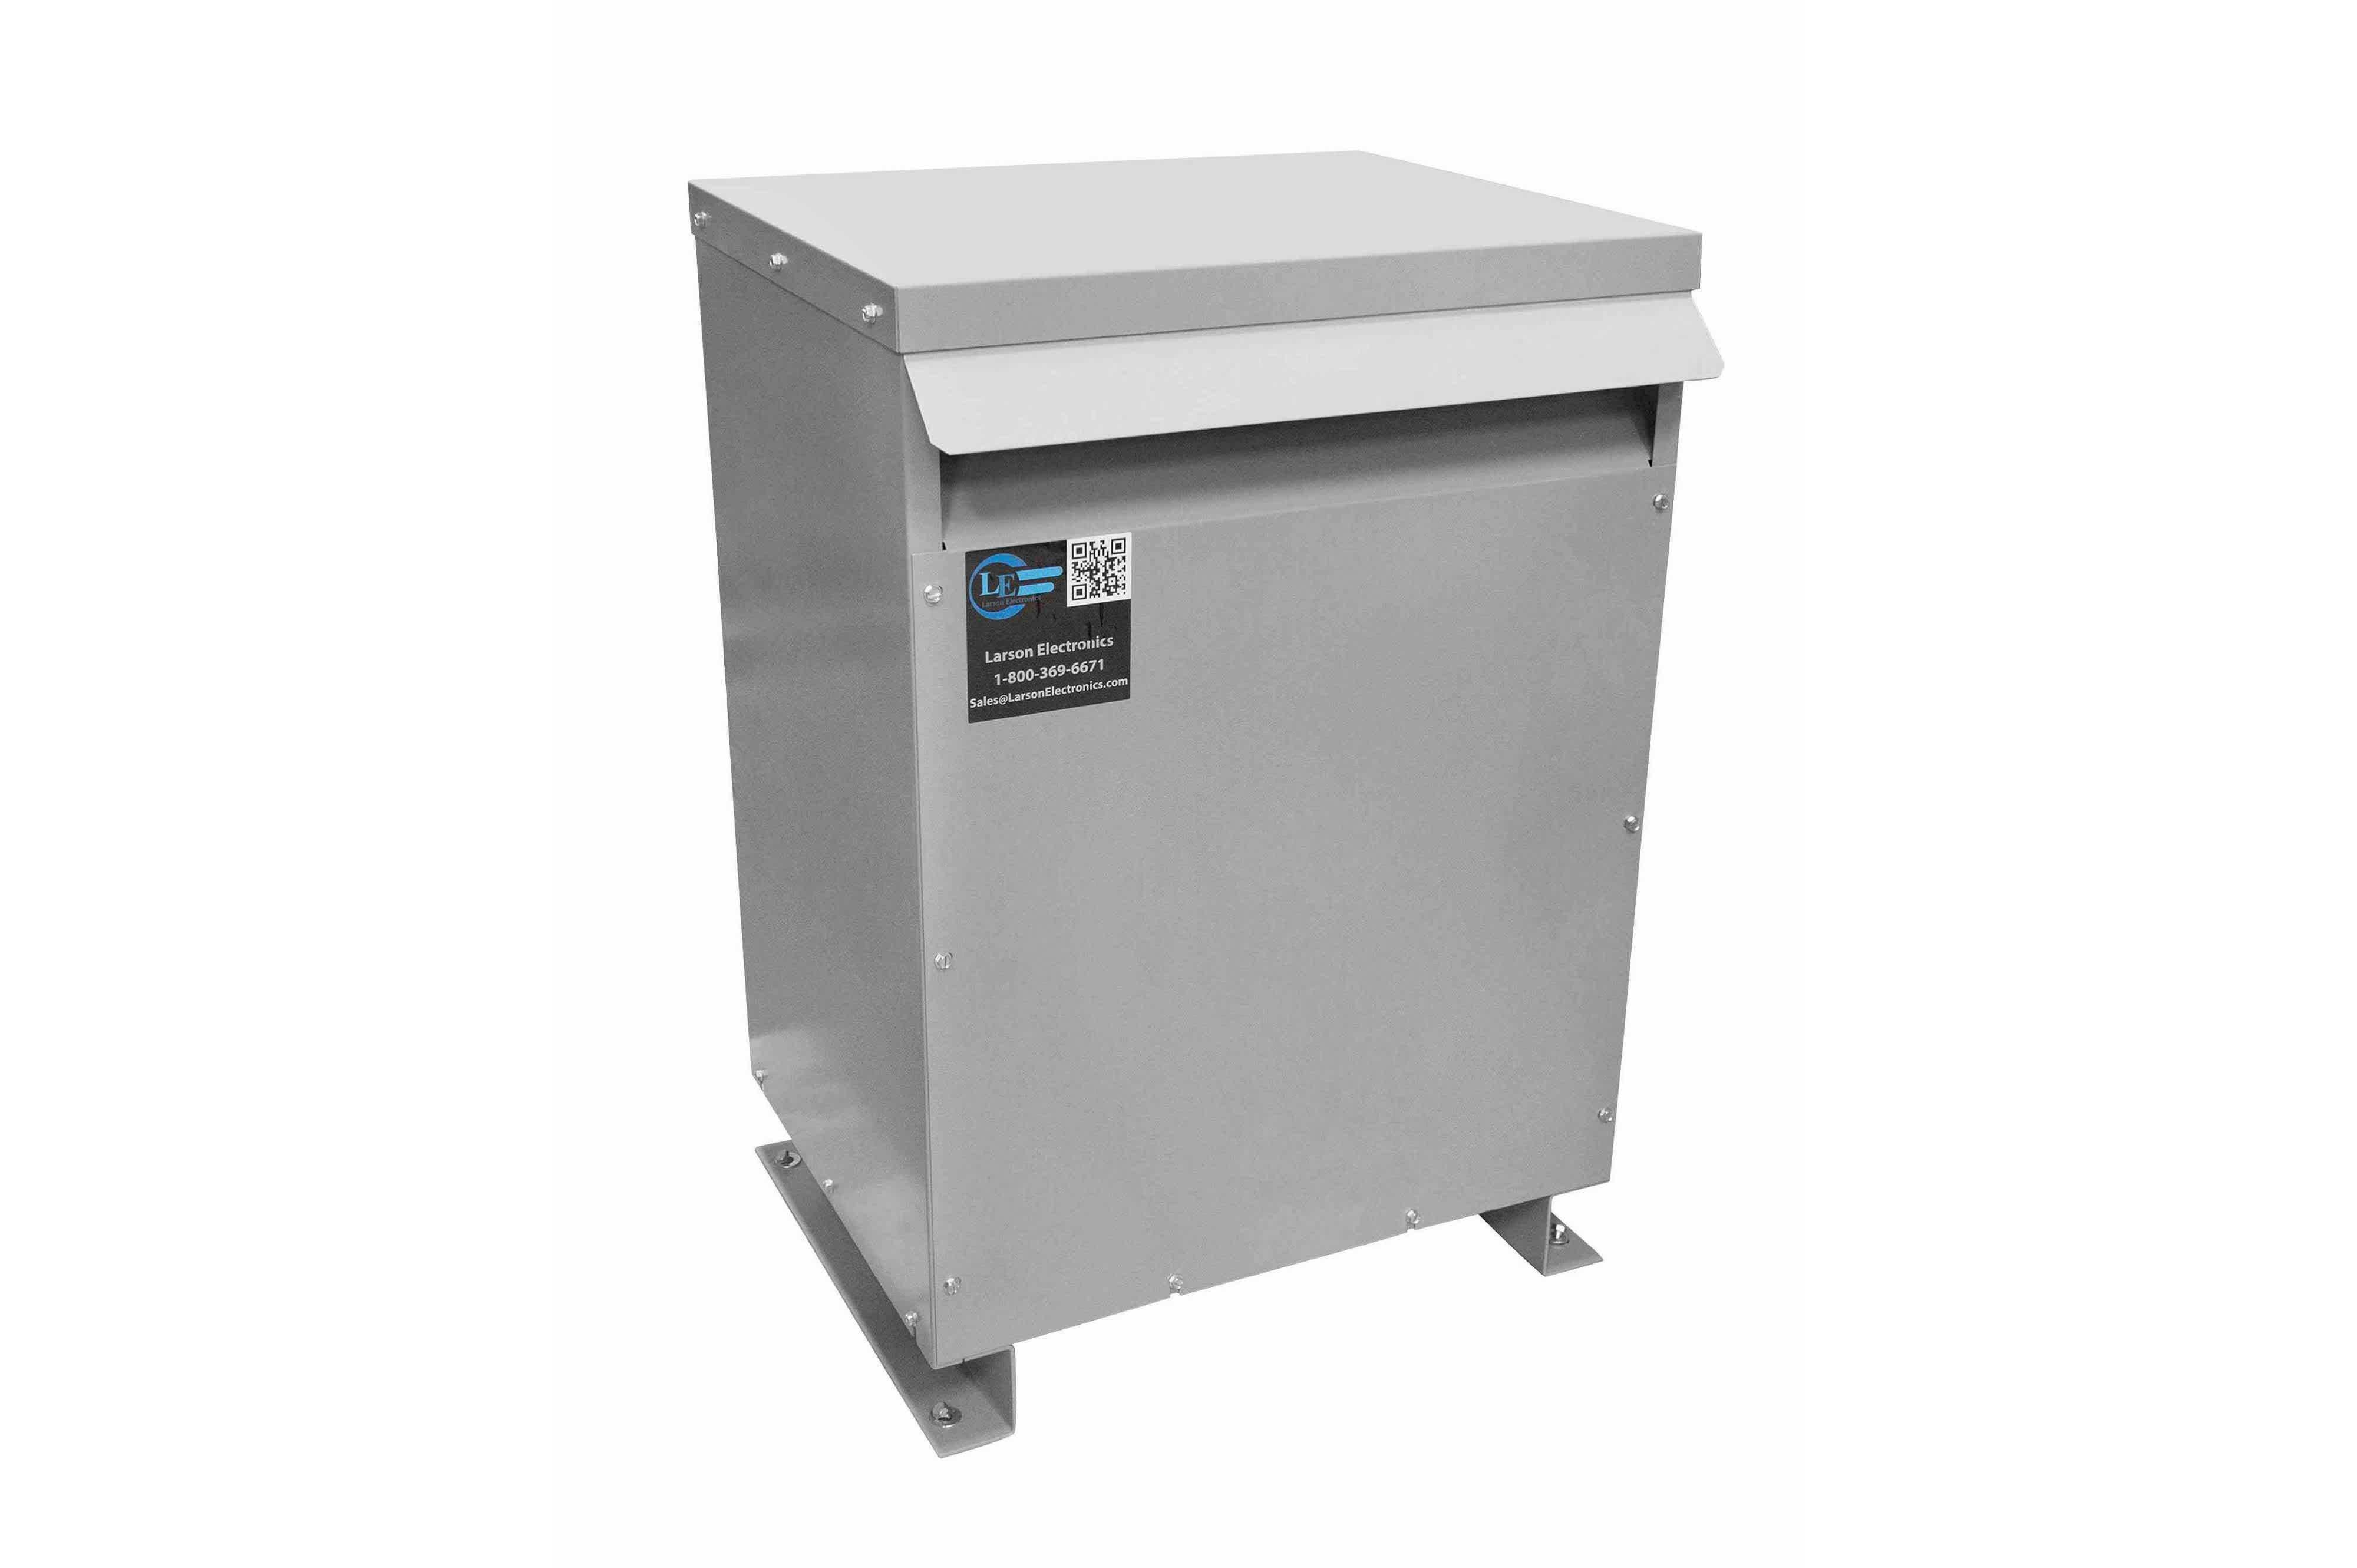 13 kVA 3PH Isolation Transformer, 600V Wye Primary, 415Y/240 Wye-N Secondary, N3R, Ventilated, 60 Hz